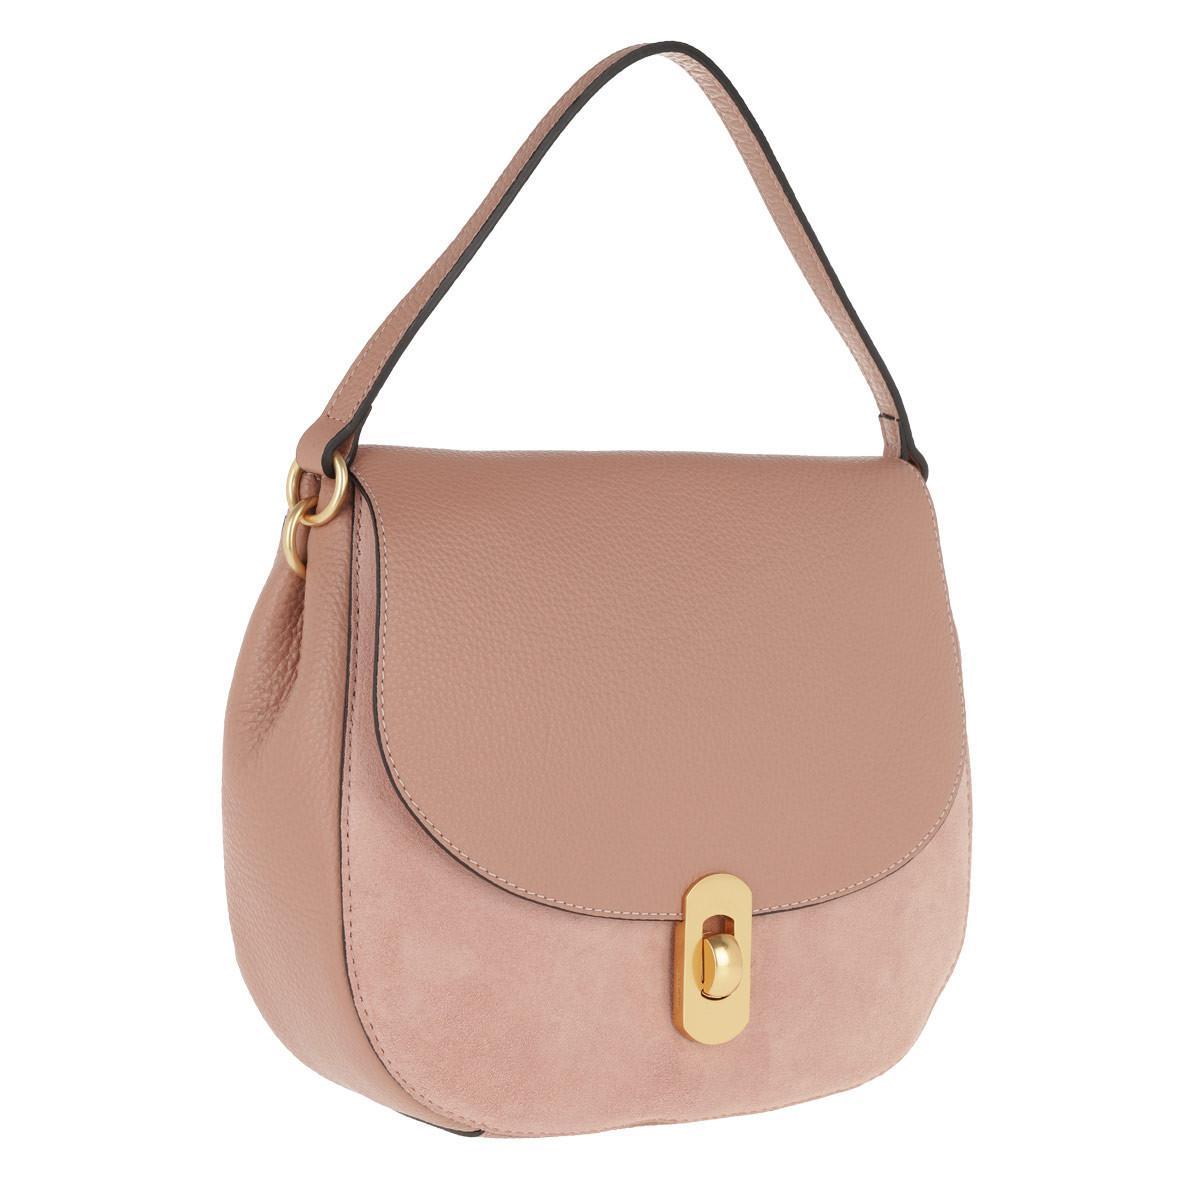 76a1775cbdf2e Coccinelle Zaniah Bimaterial Hobo Bag New Pivoine in Pink - Lyst